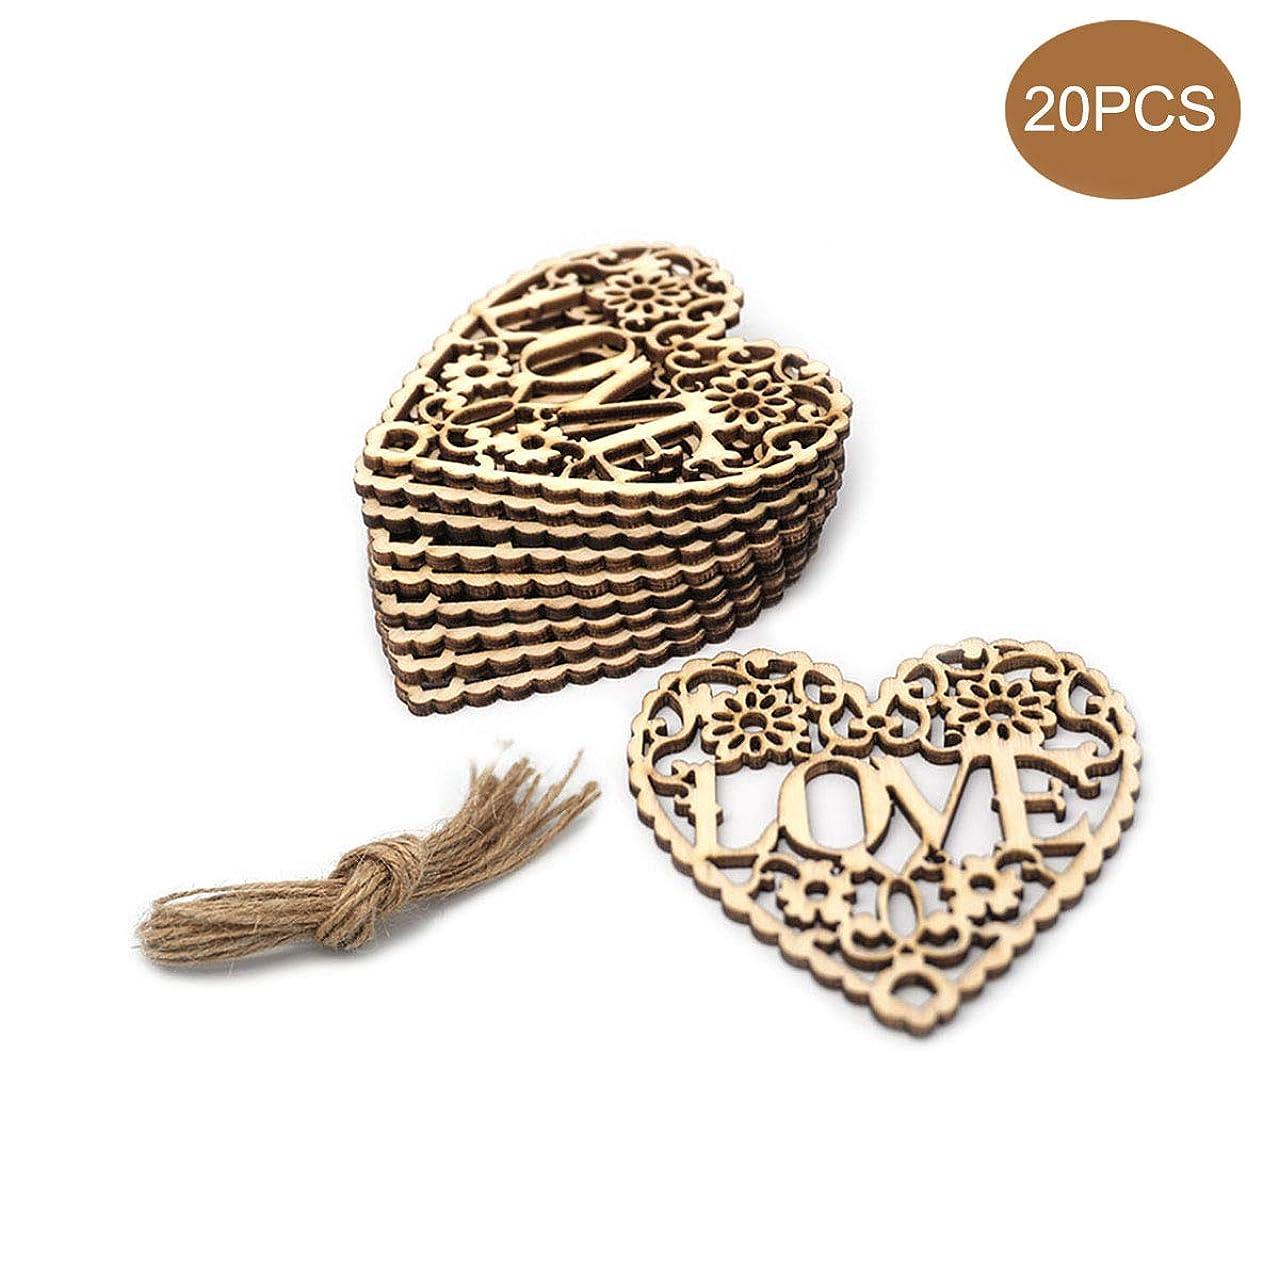 20PCS Heart Shaped Wooden Embellishments,